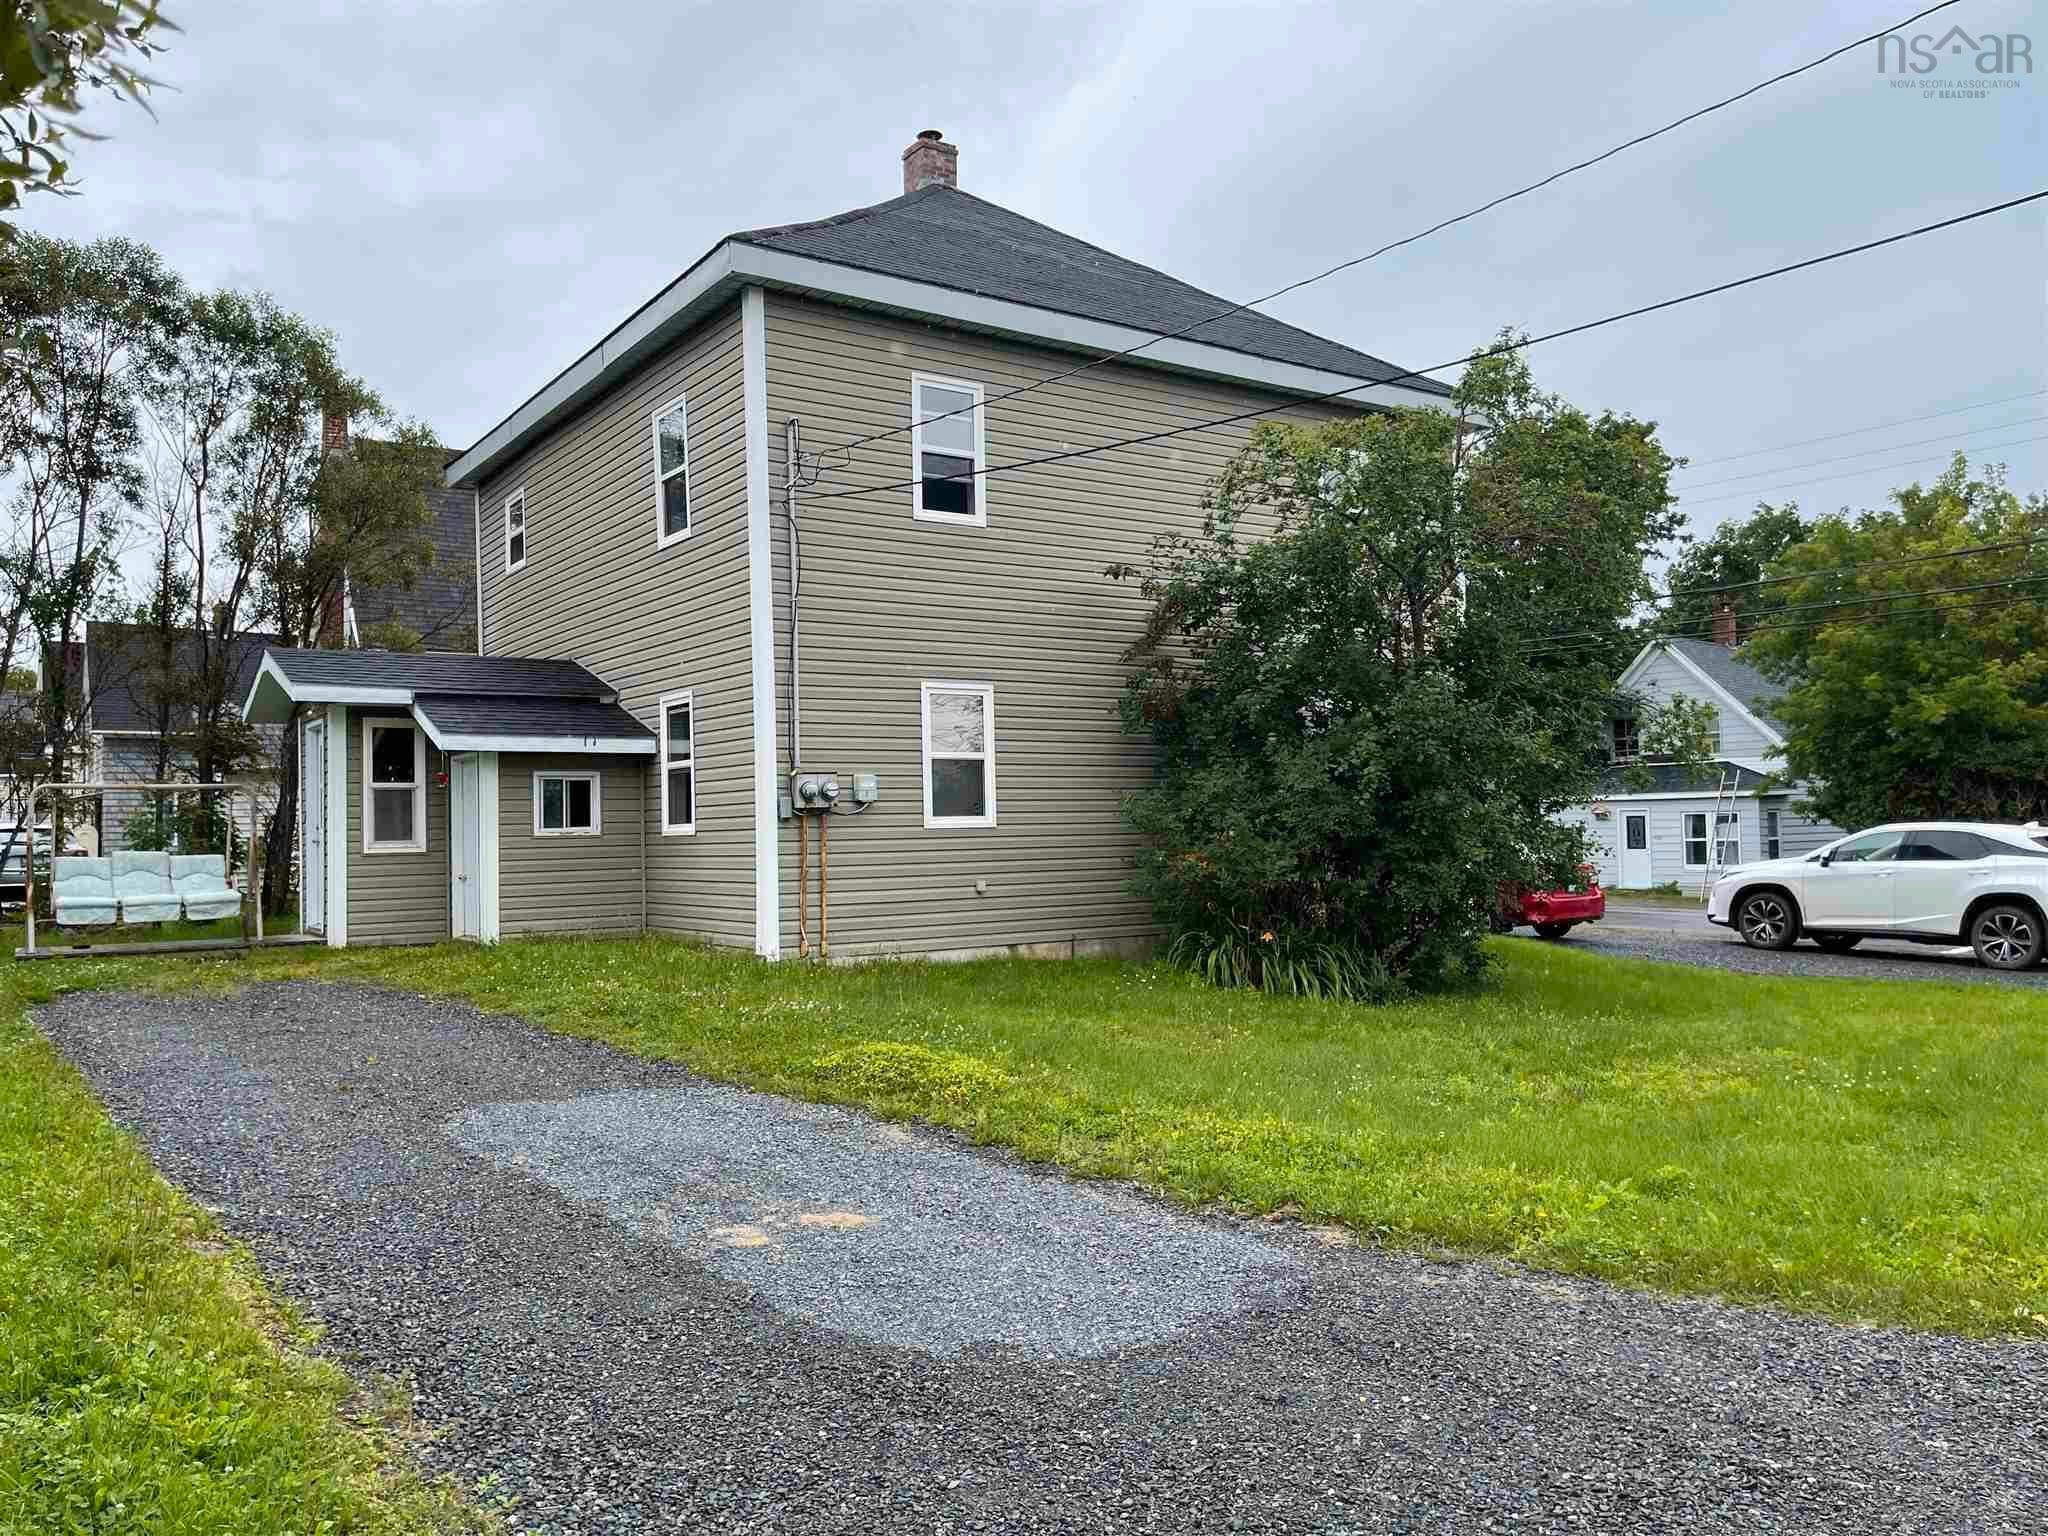 Main Photo: 2077 South Main Street in Westville: 107-Trenton,Westville,Pictou Multi-Family for sale (Northern Region)  : MLS®# 202119842